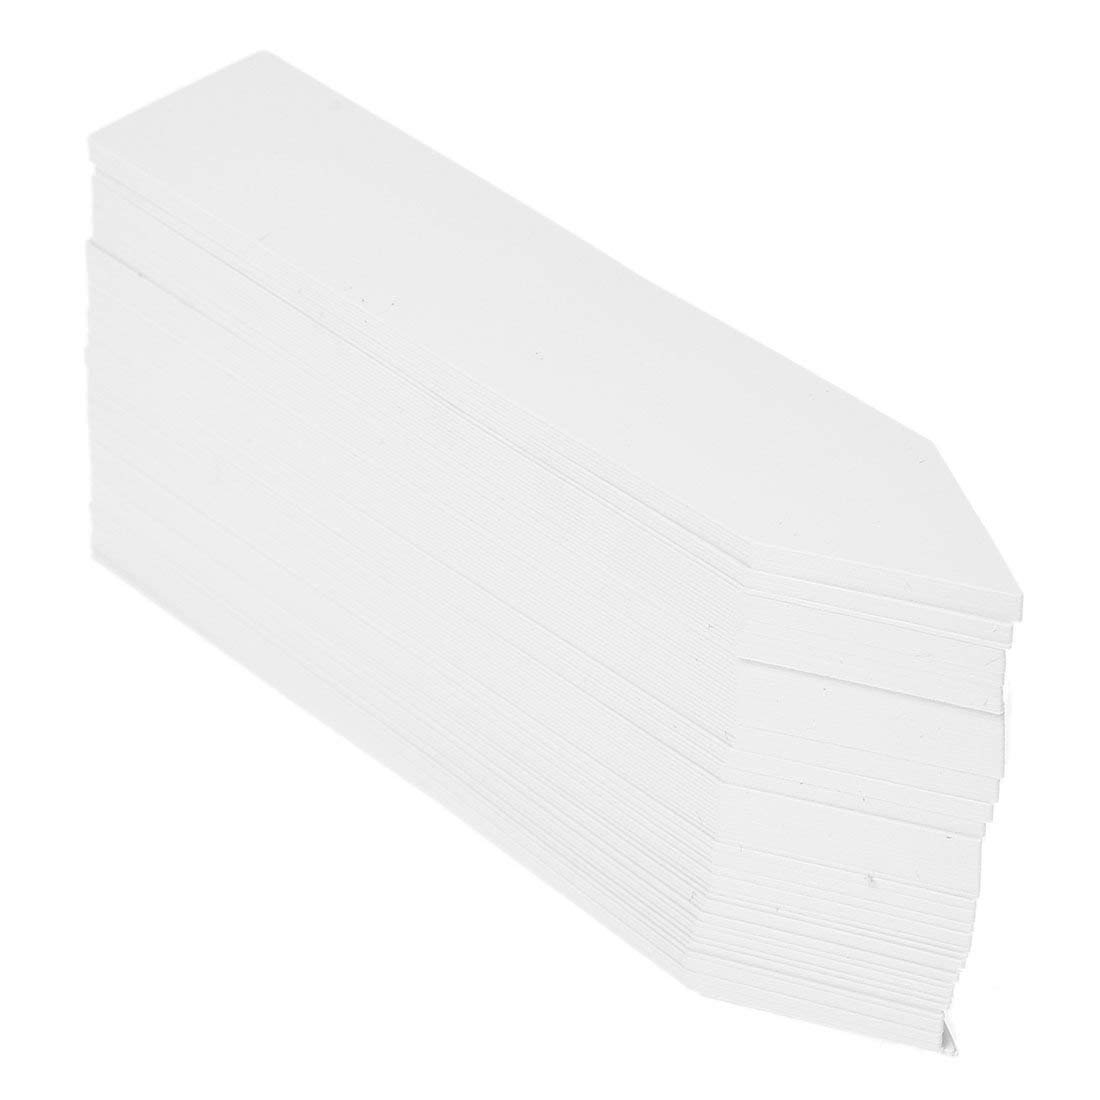 TOOGOO(R) 100 Pcs Plastic Plant Seed Labels Pot Marker Nursery Garden Stake Tags 10cm x 2cm (White)